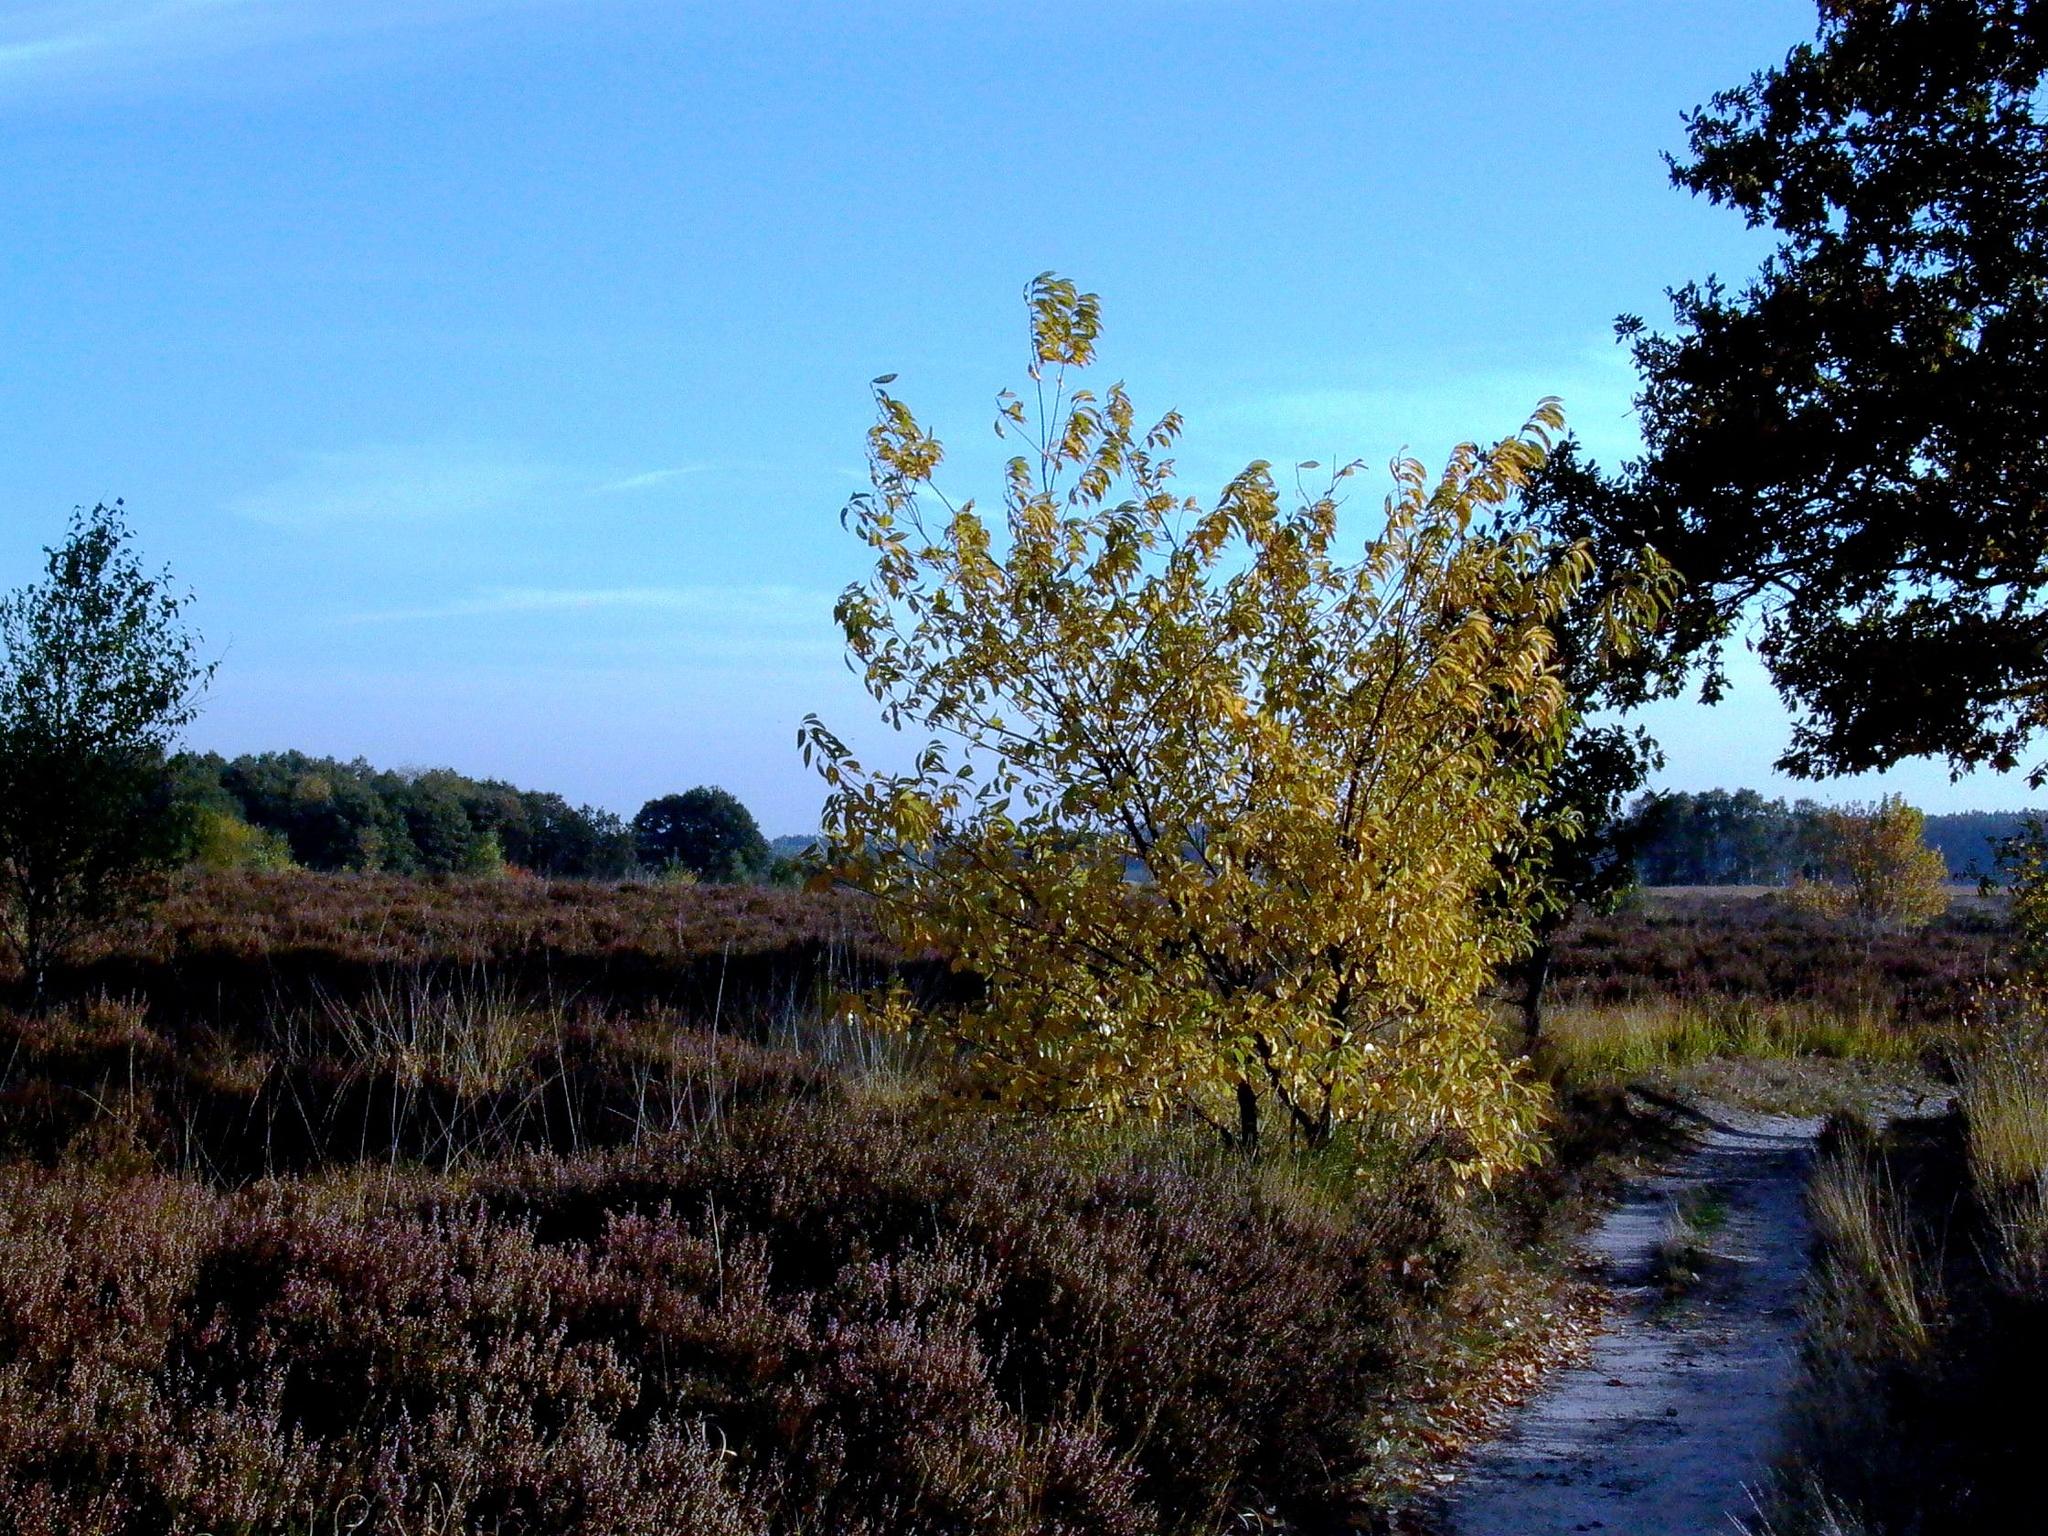 Autumn walk  by leo.vleugels.3